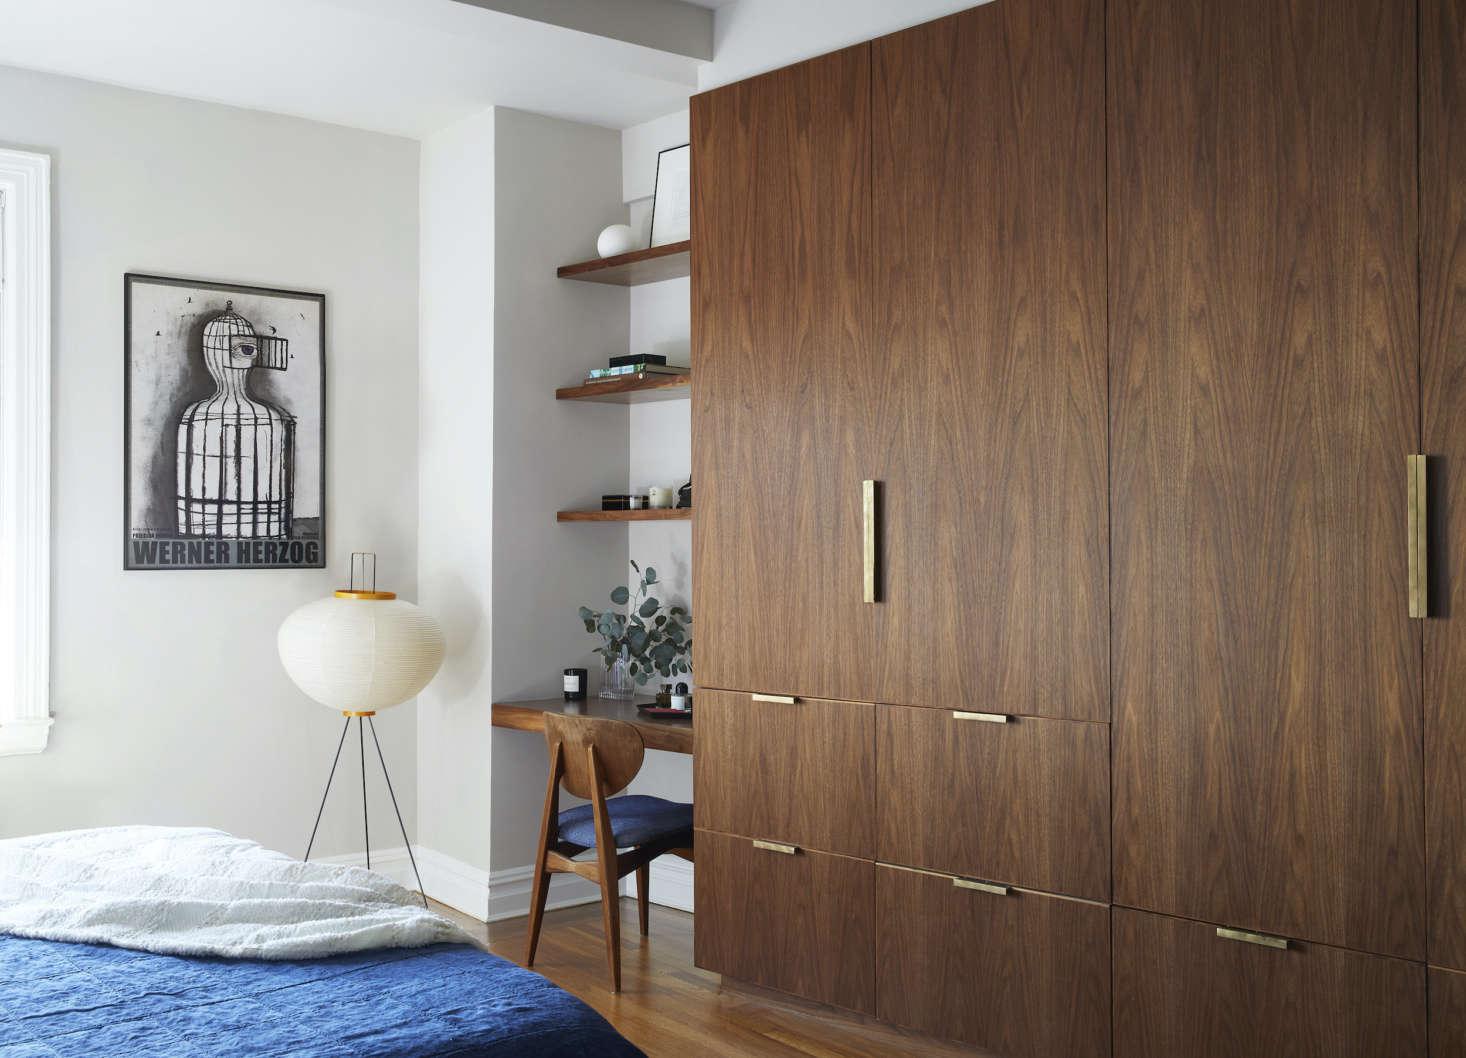 The firm designed the custom walnut closets. The floor lamp is a Noguchi. (Seesrc=